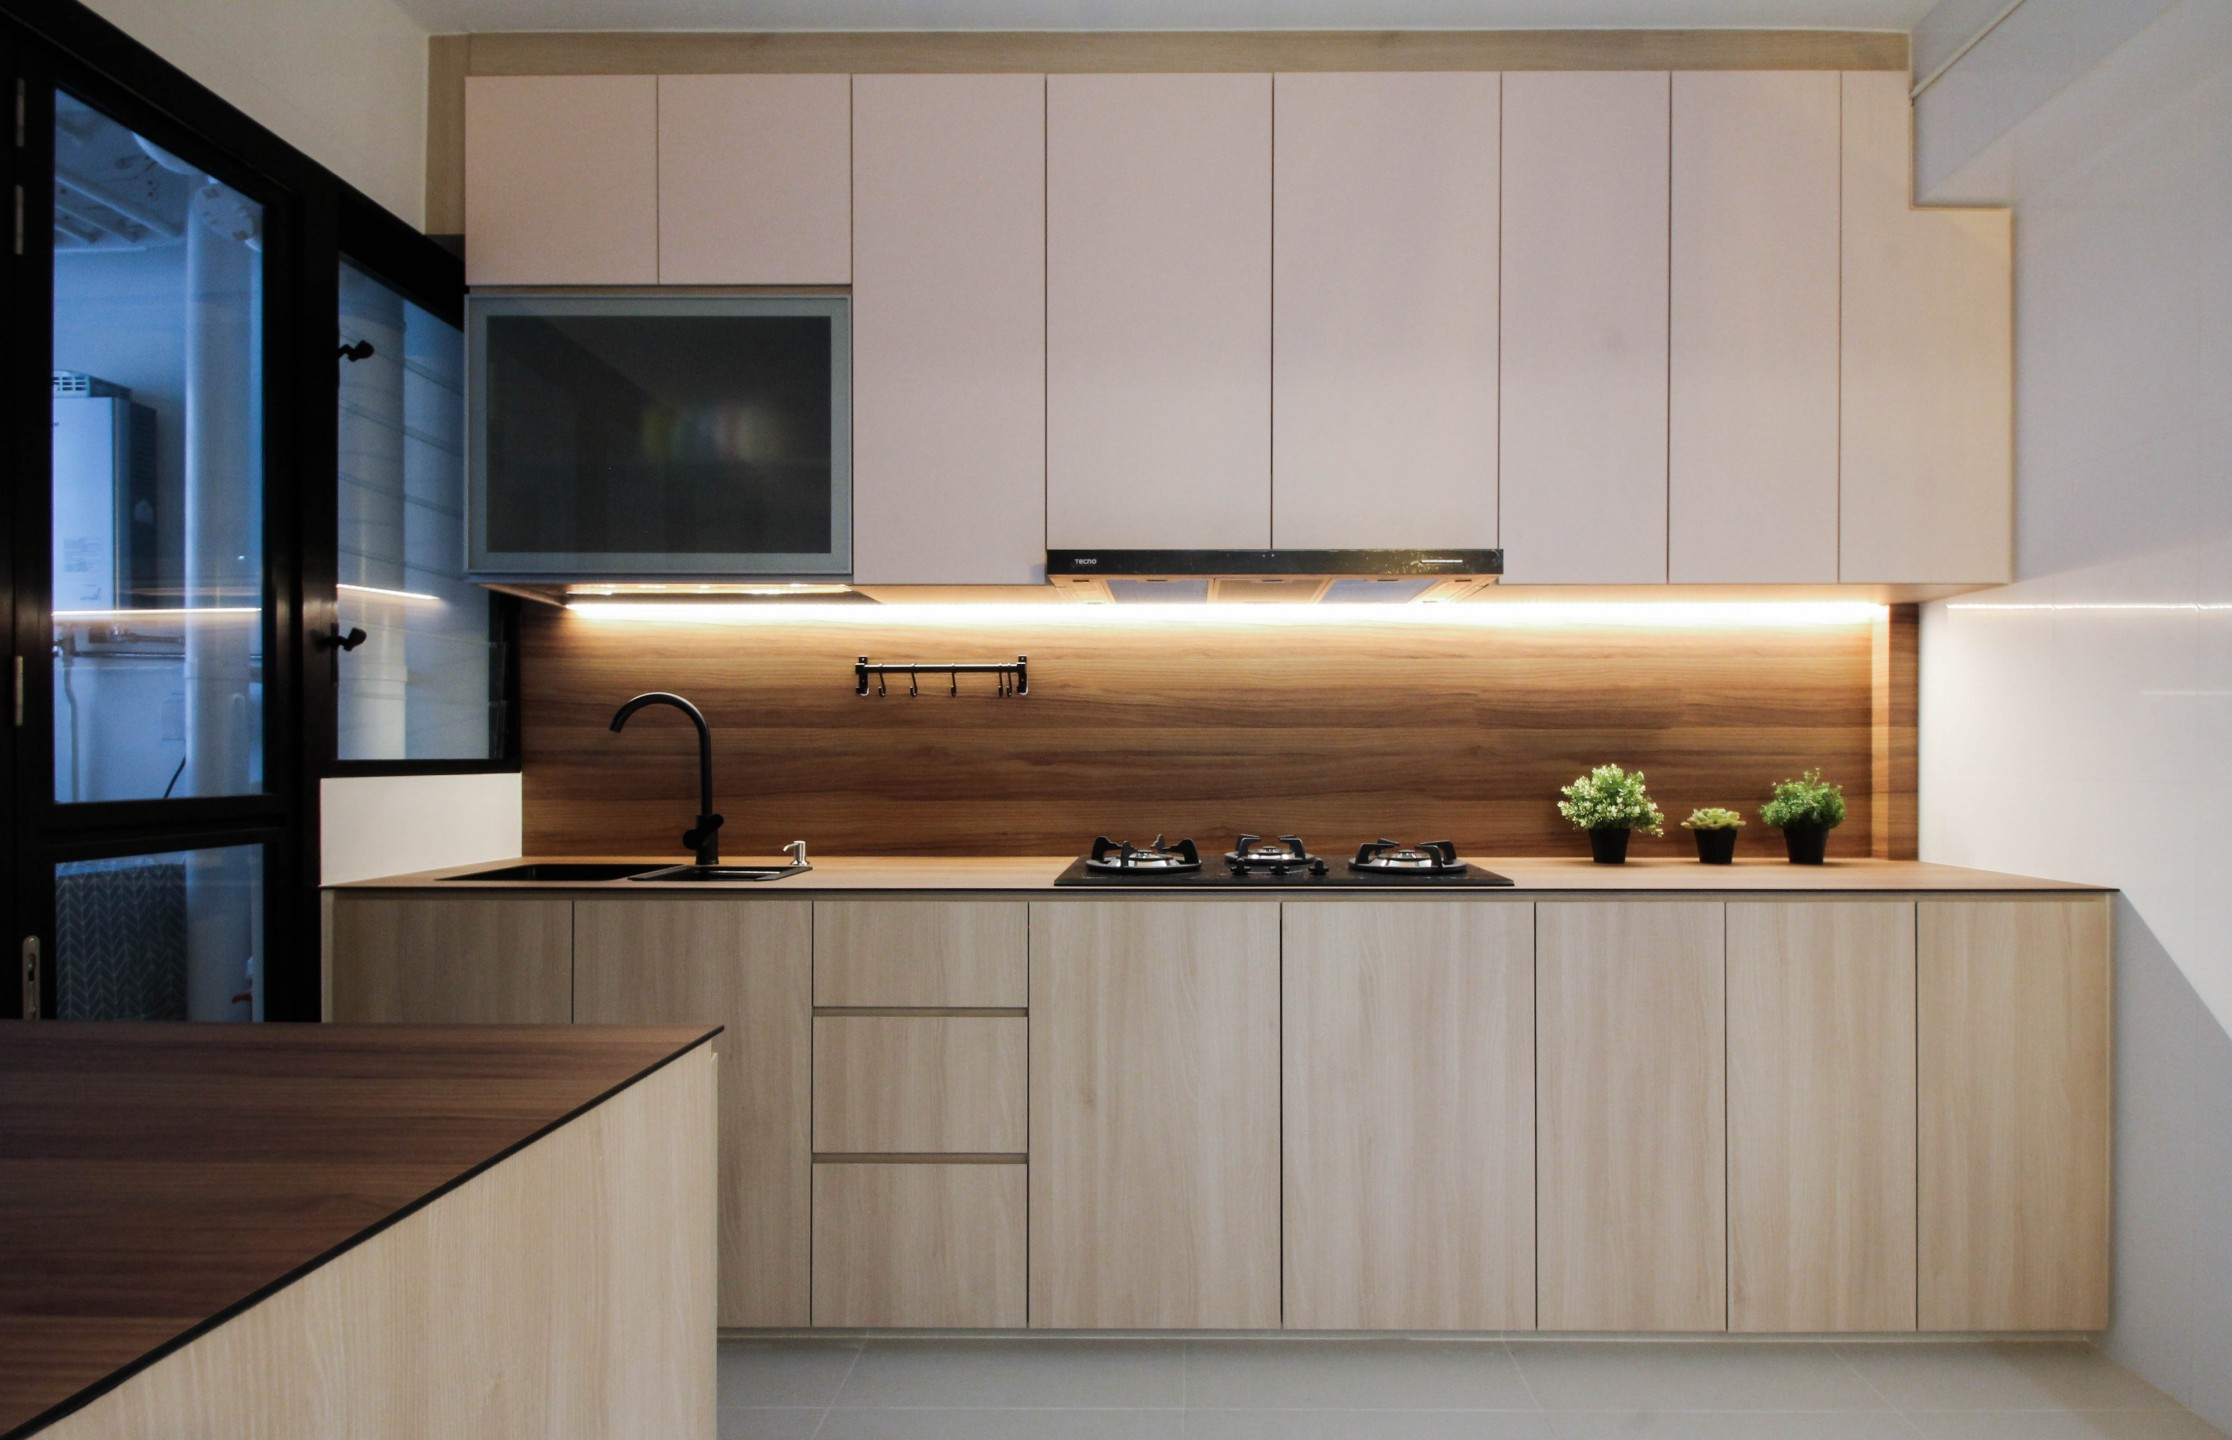 squarerooms-sense-semblance-tampines-kitchen